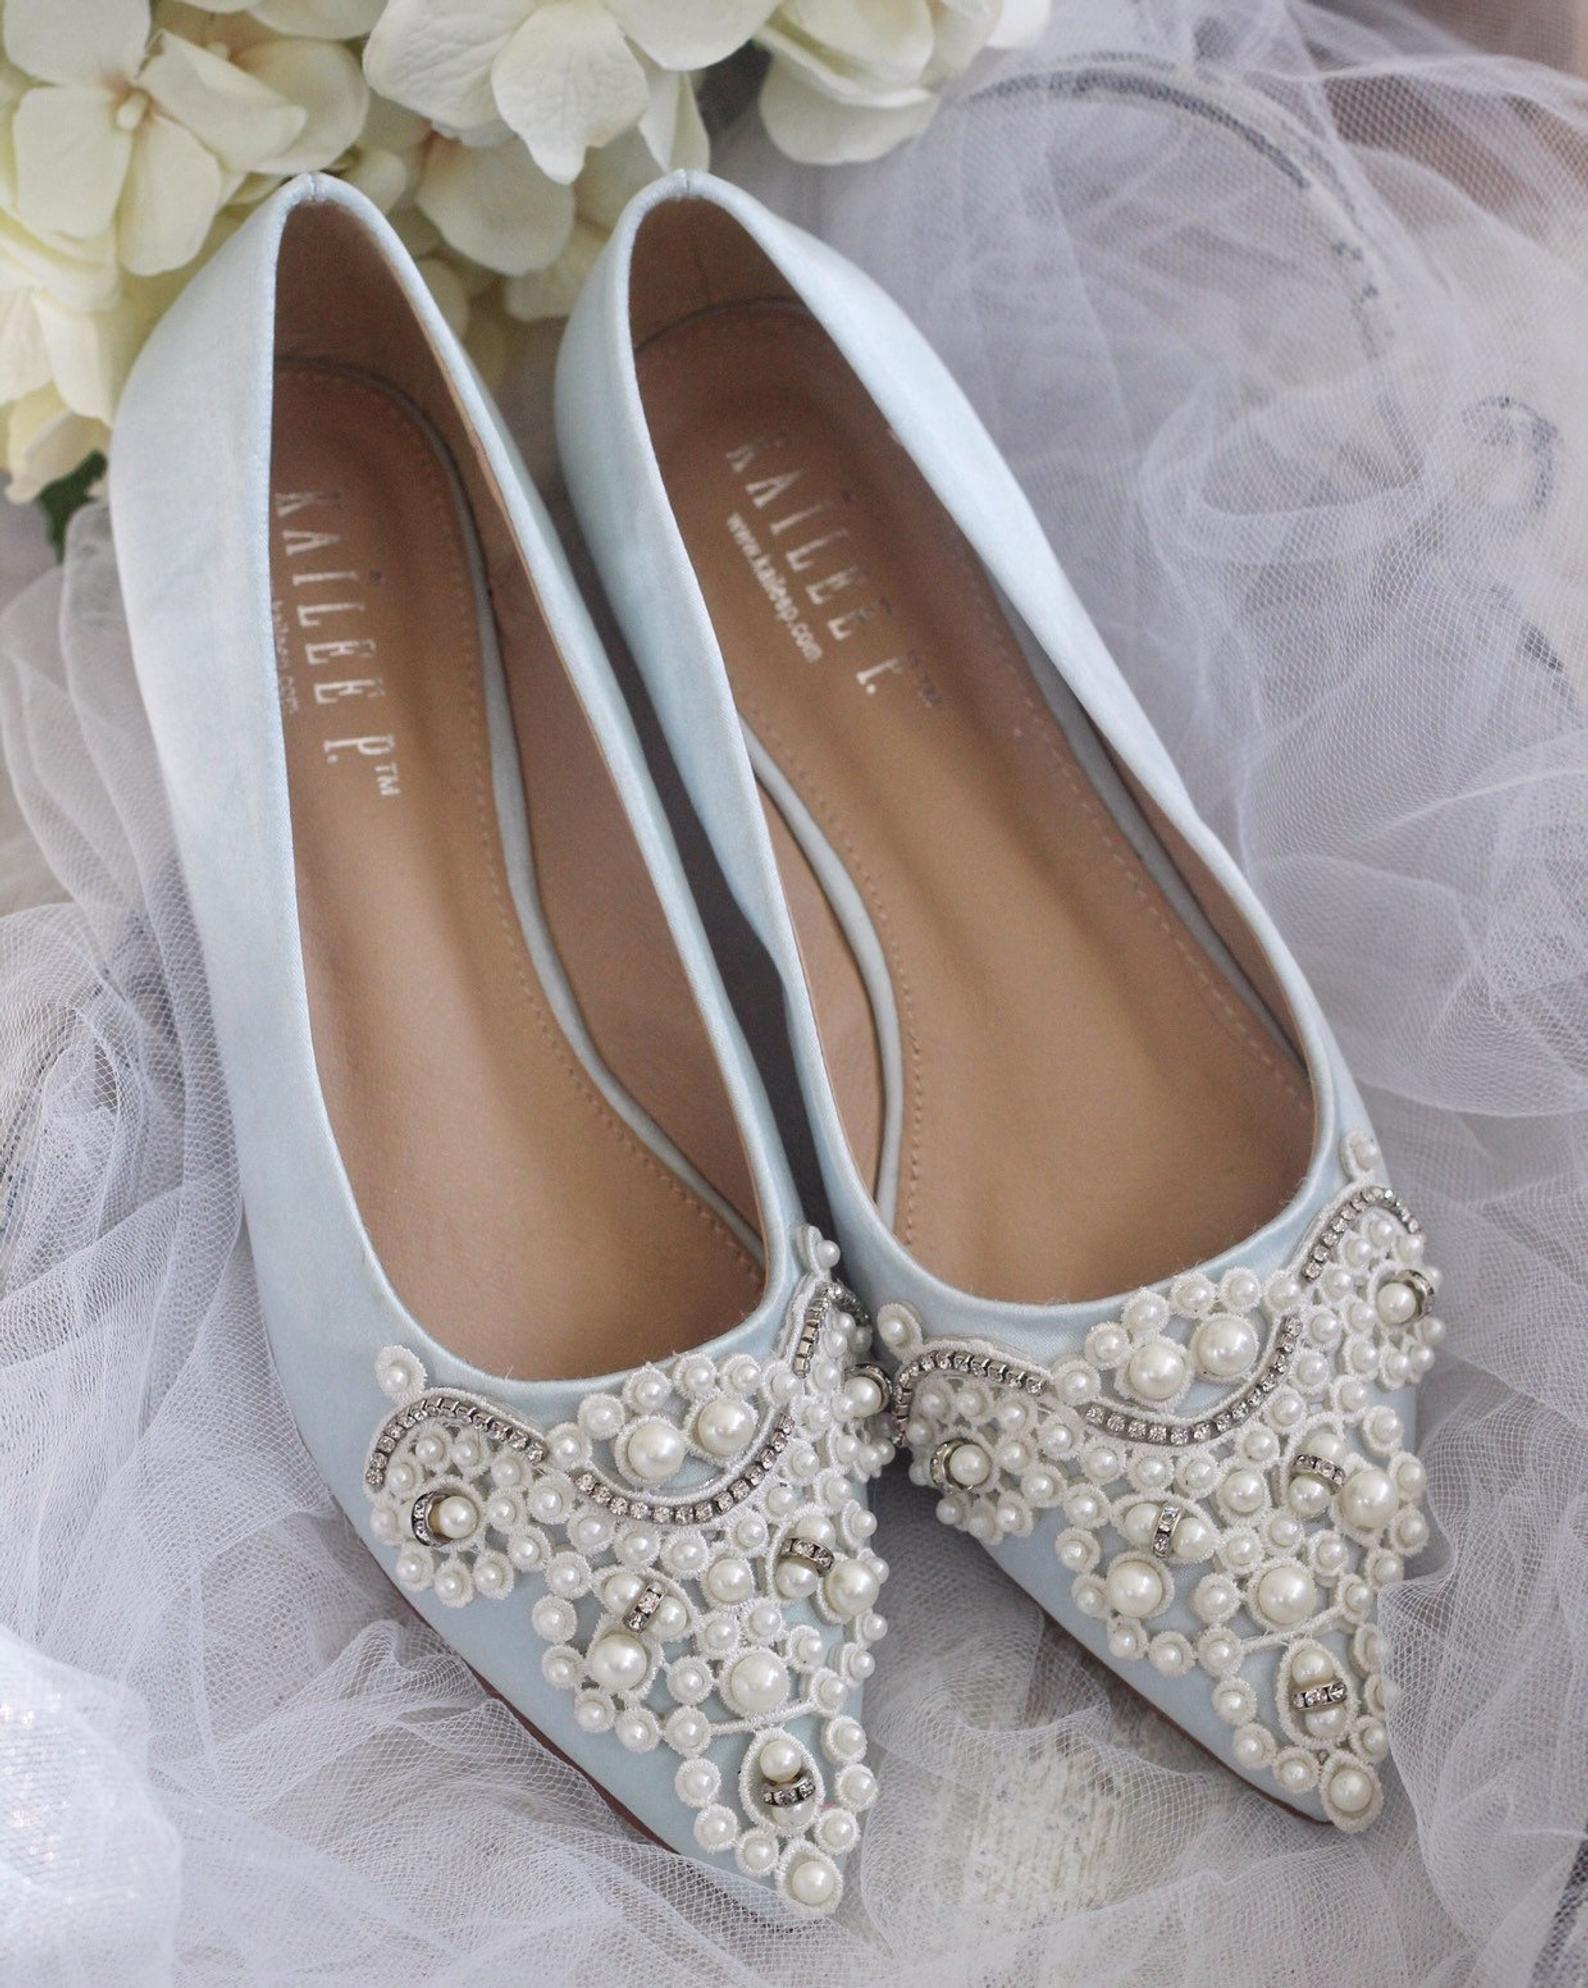 Light blue satin pointy toe satin flats with oversized